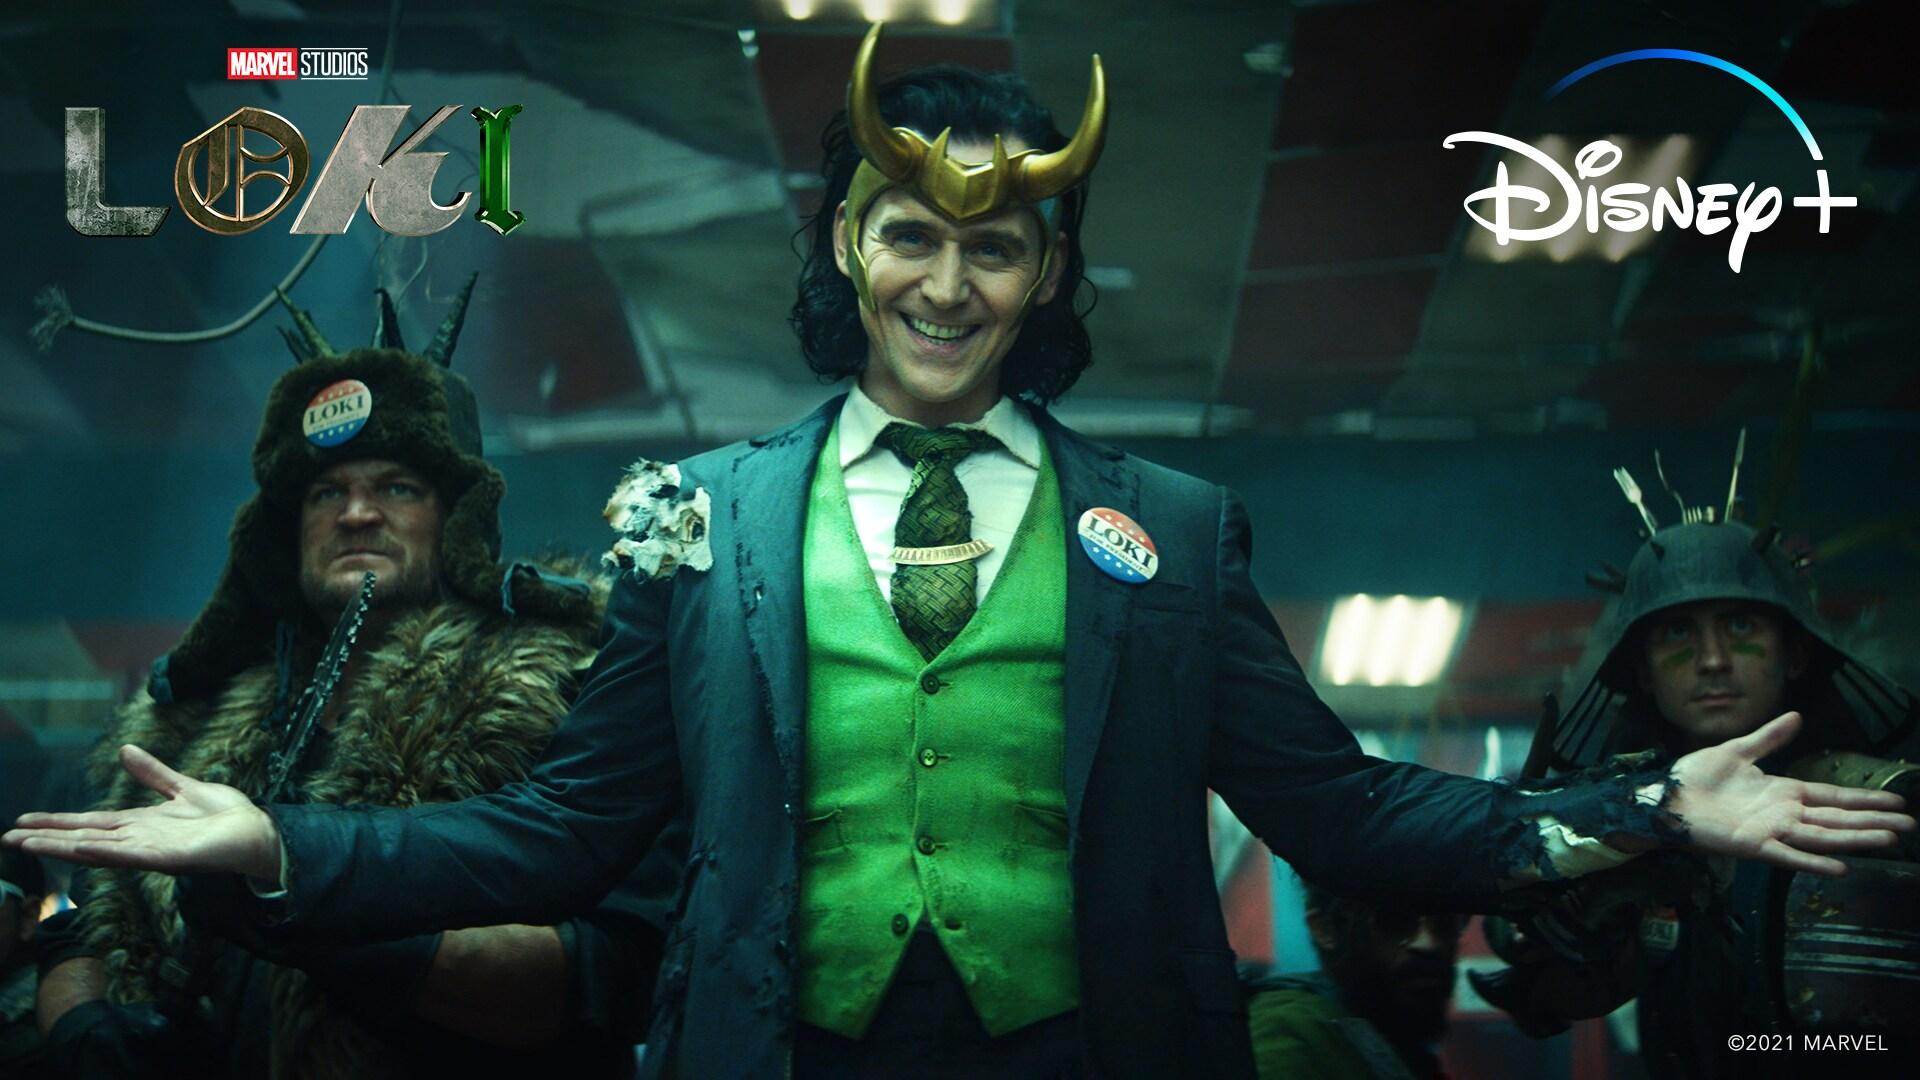 Tom Hiddleston Shares Career Tips (and Tricks) Inspired by Marvel Studios' Loki | What's Up, Disney+